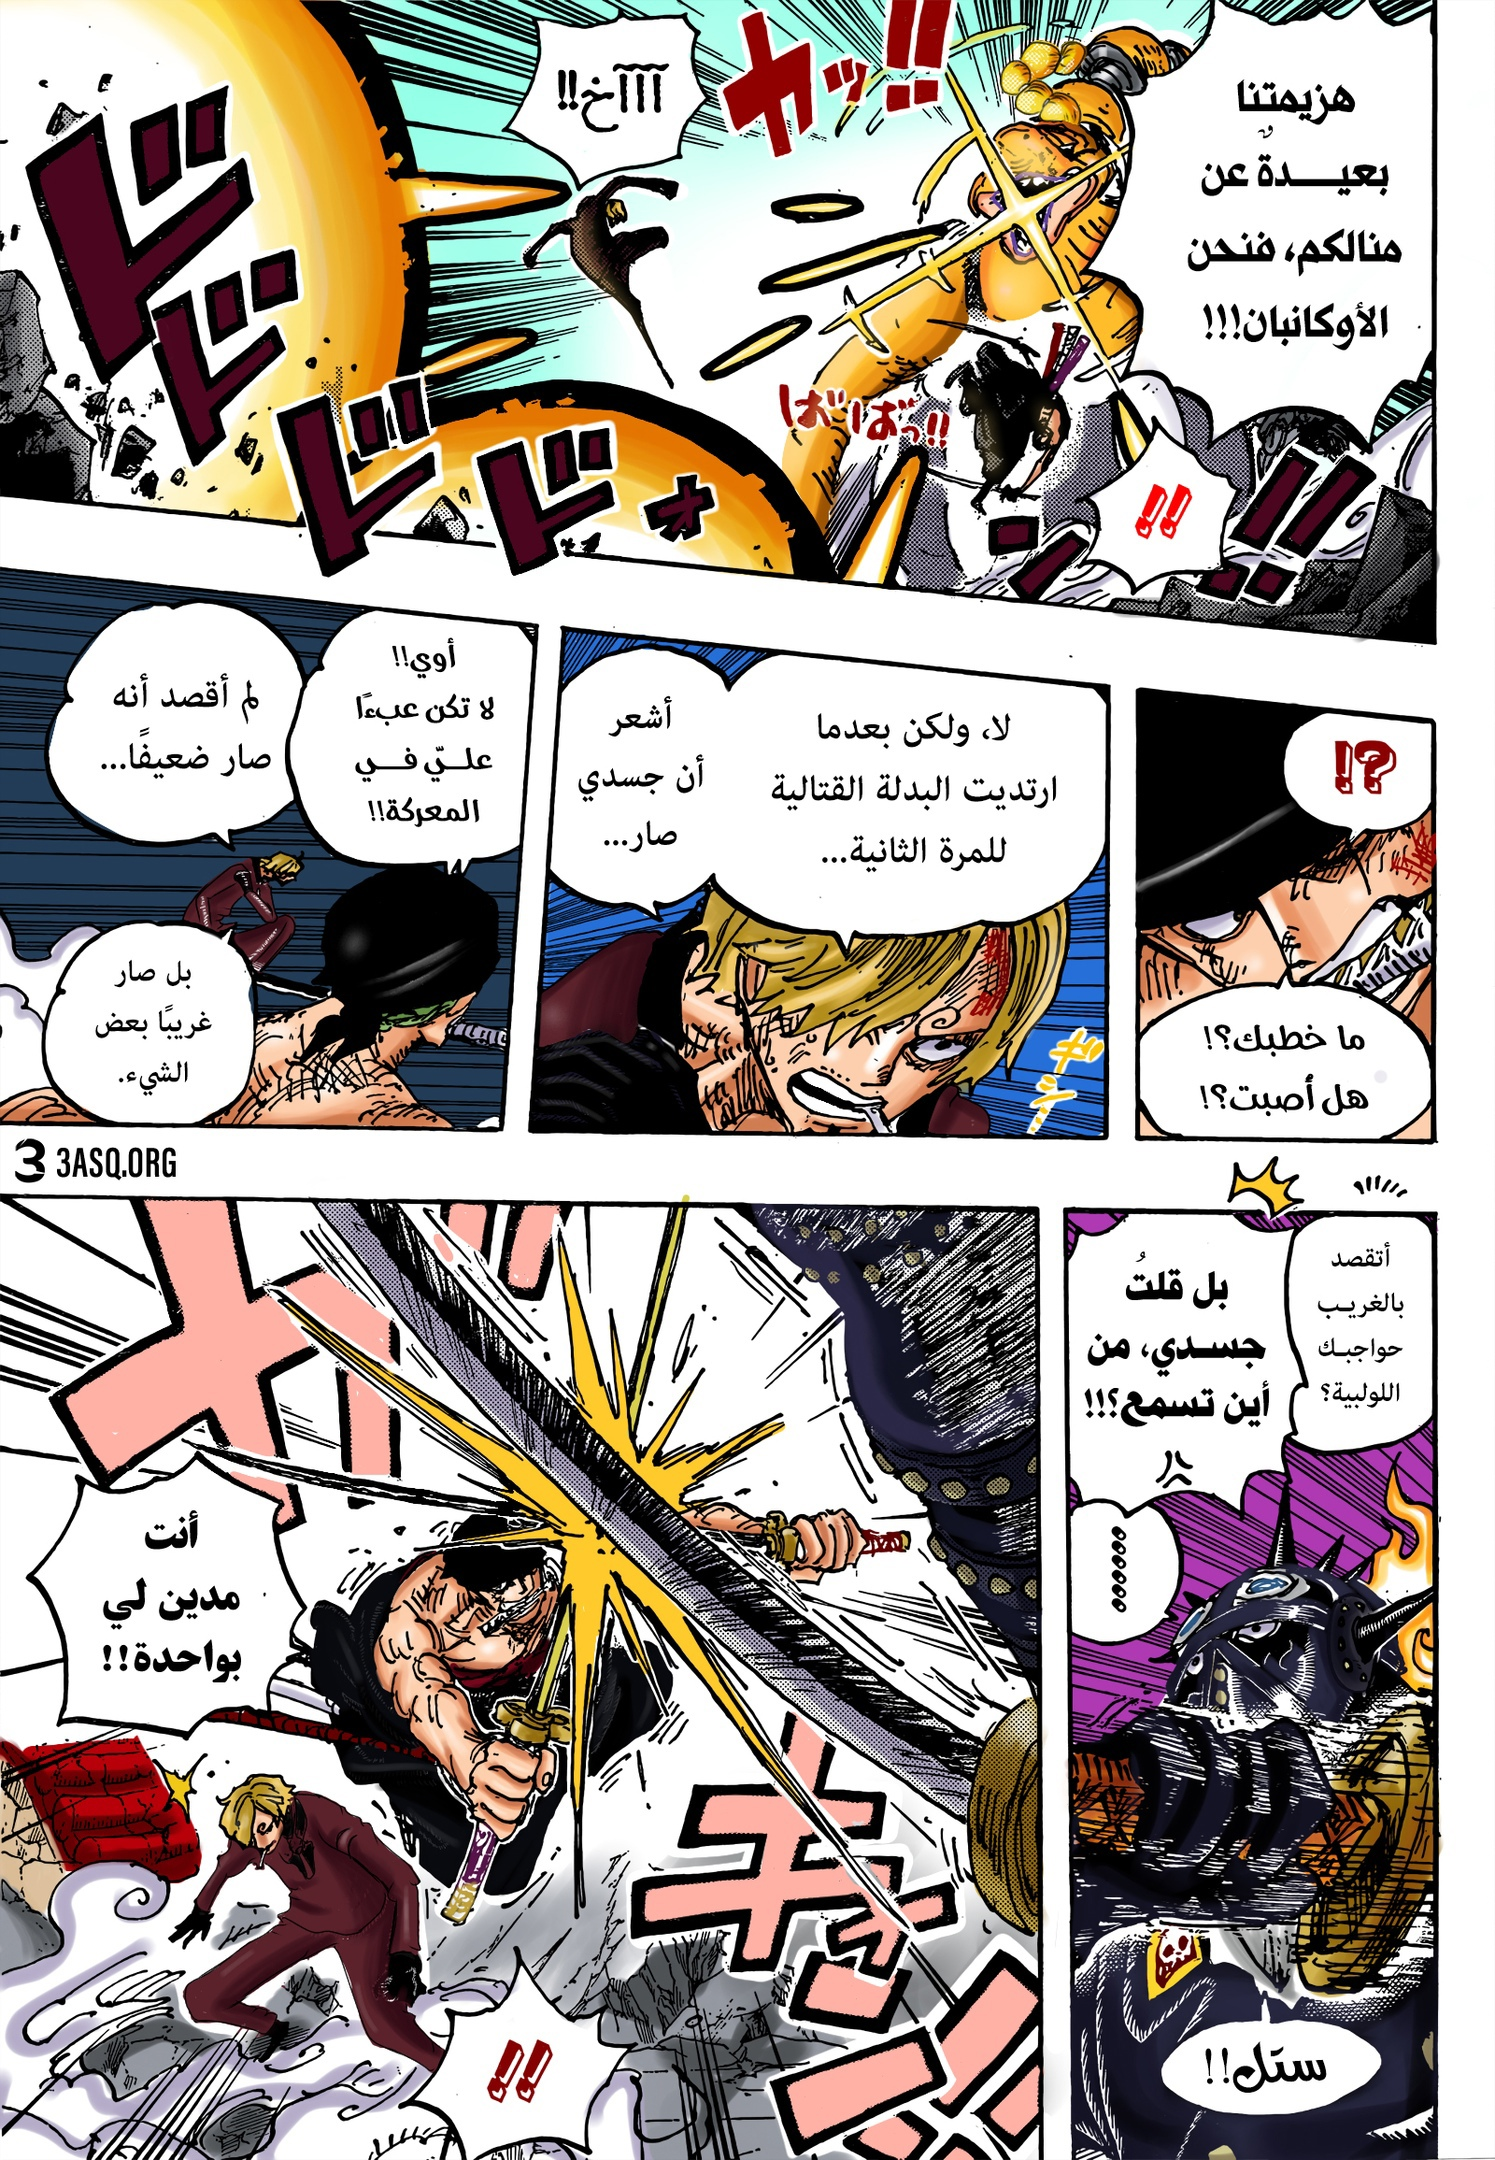 One Piece Arab 1023, image №23